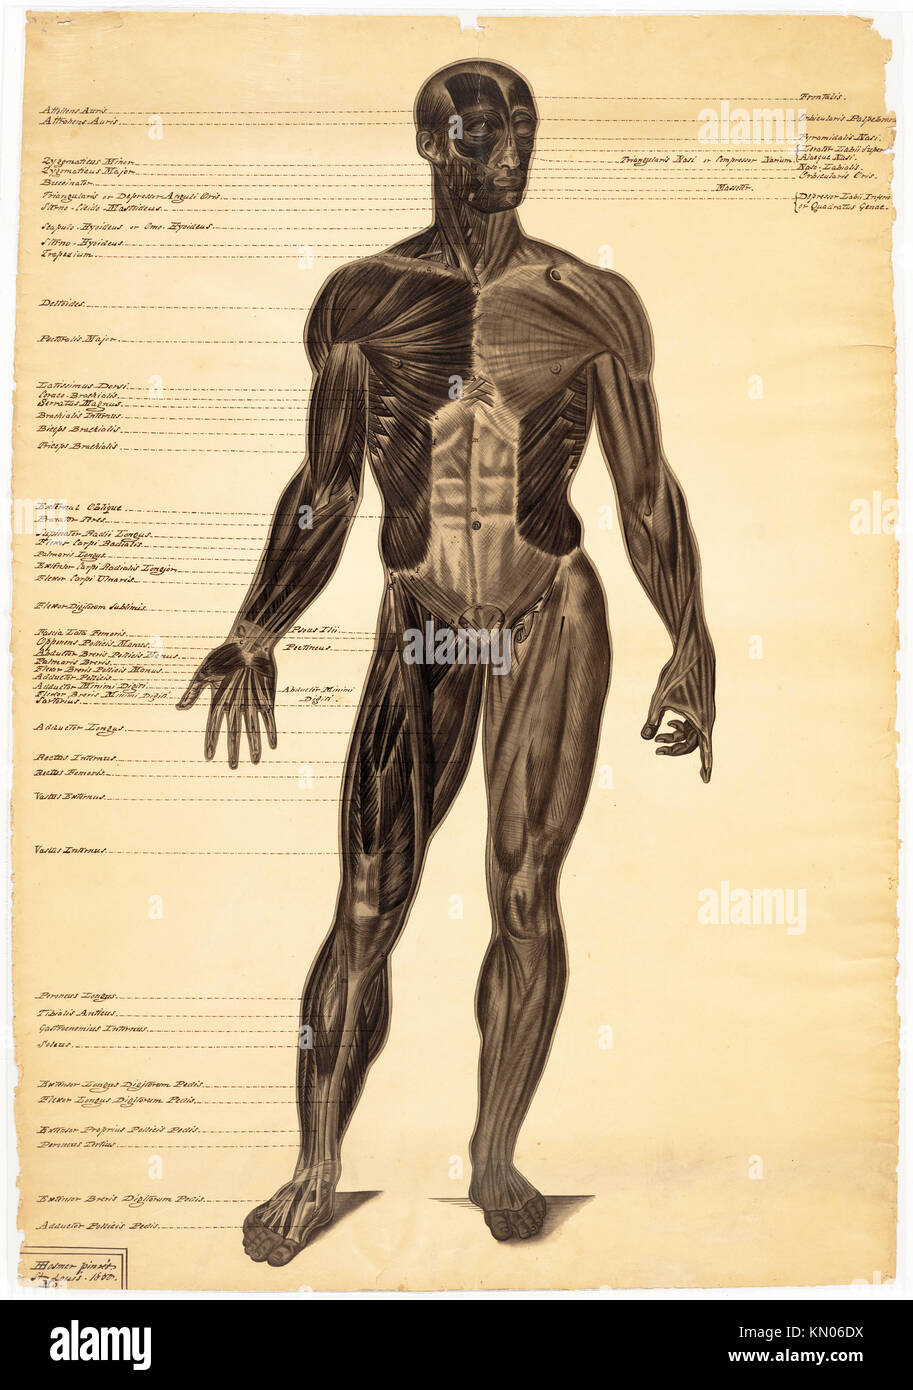 Anatomical Diagram Muscles Stock Photos Anatomical Diagram Muscles